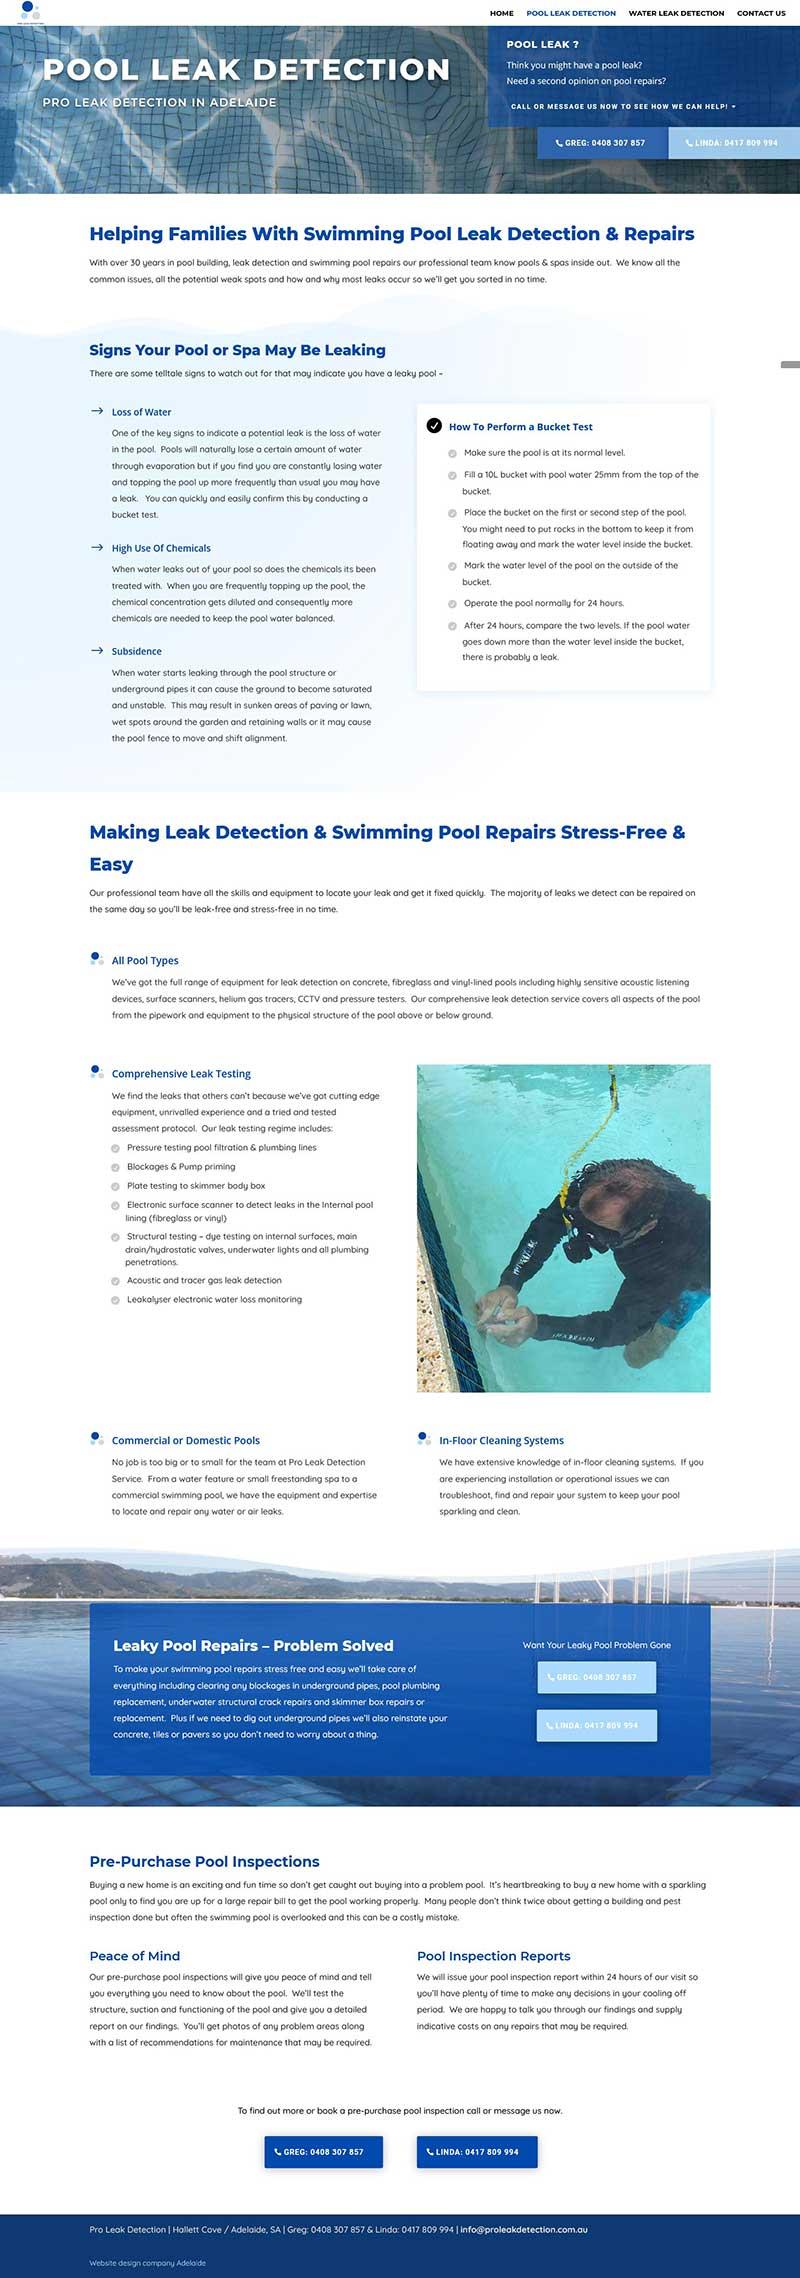 Business website for leak detection business in Adelaide